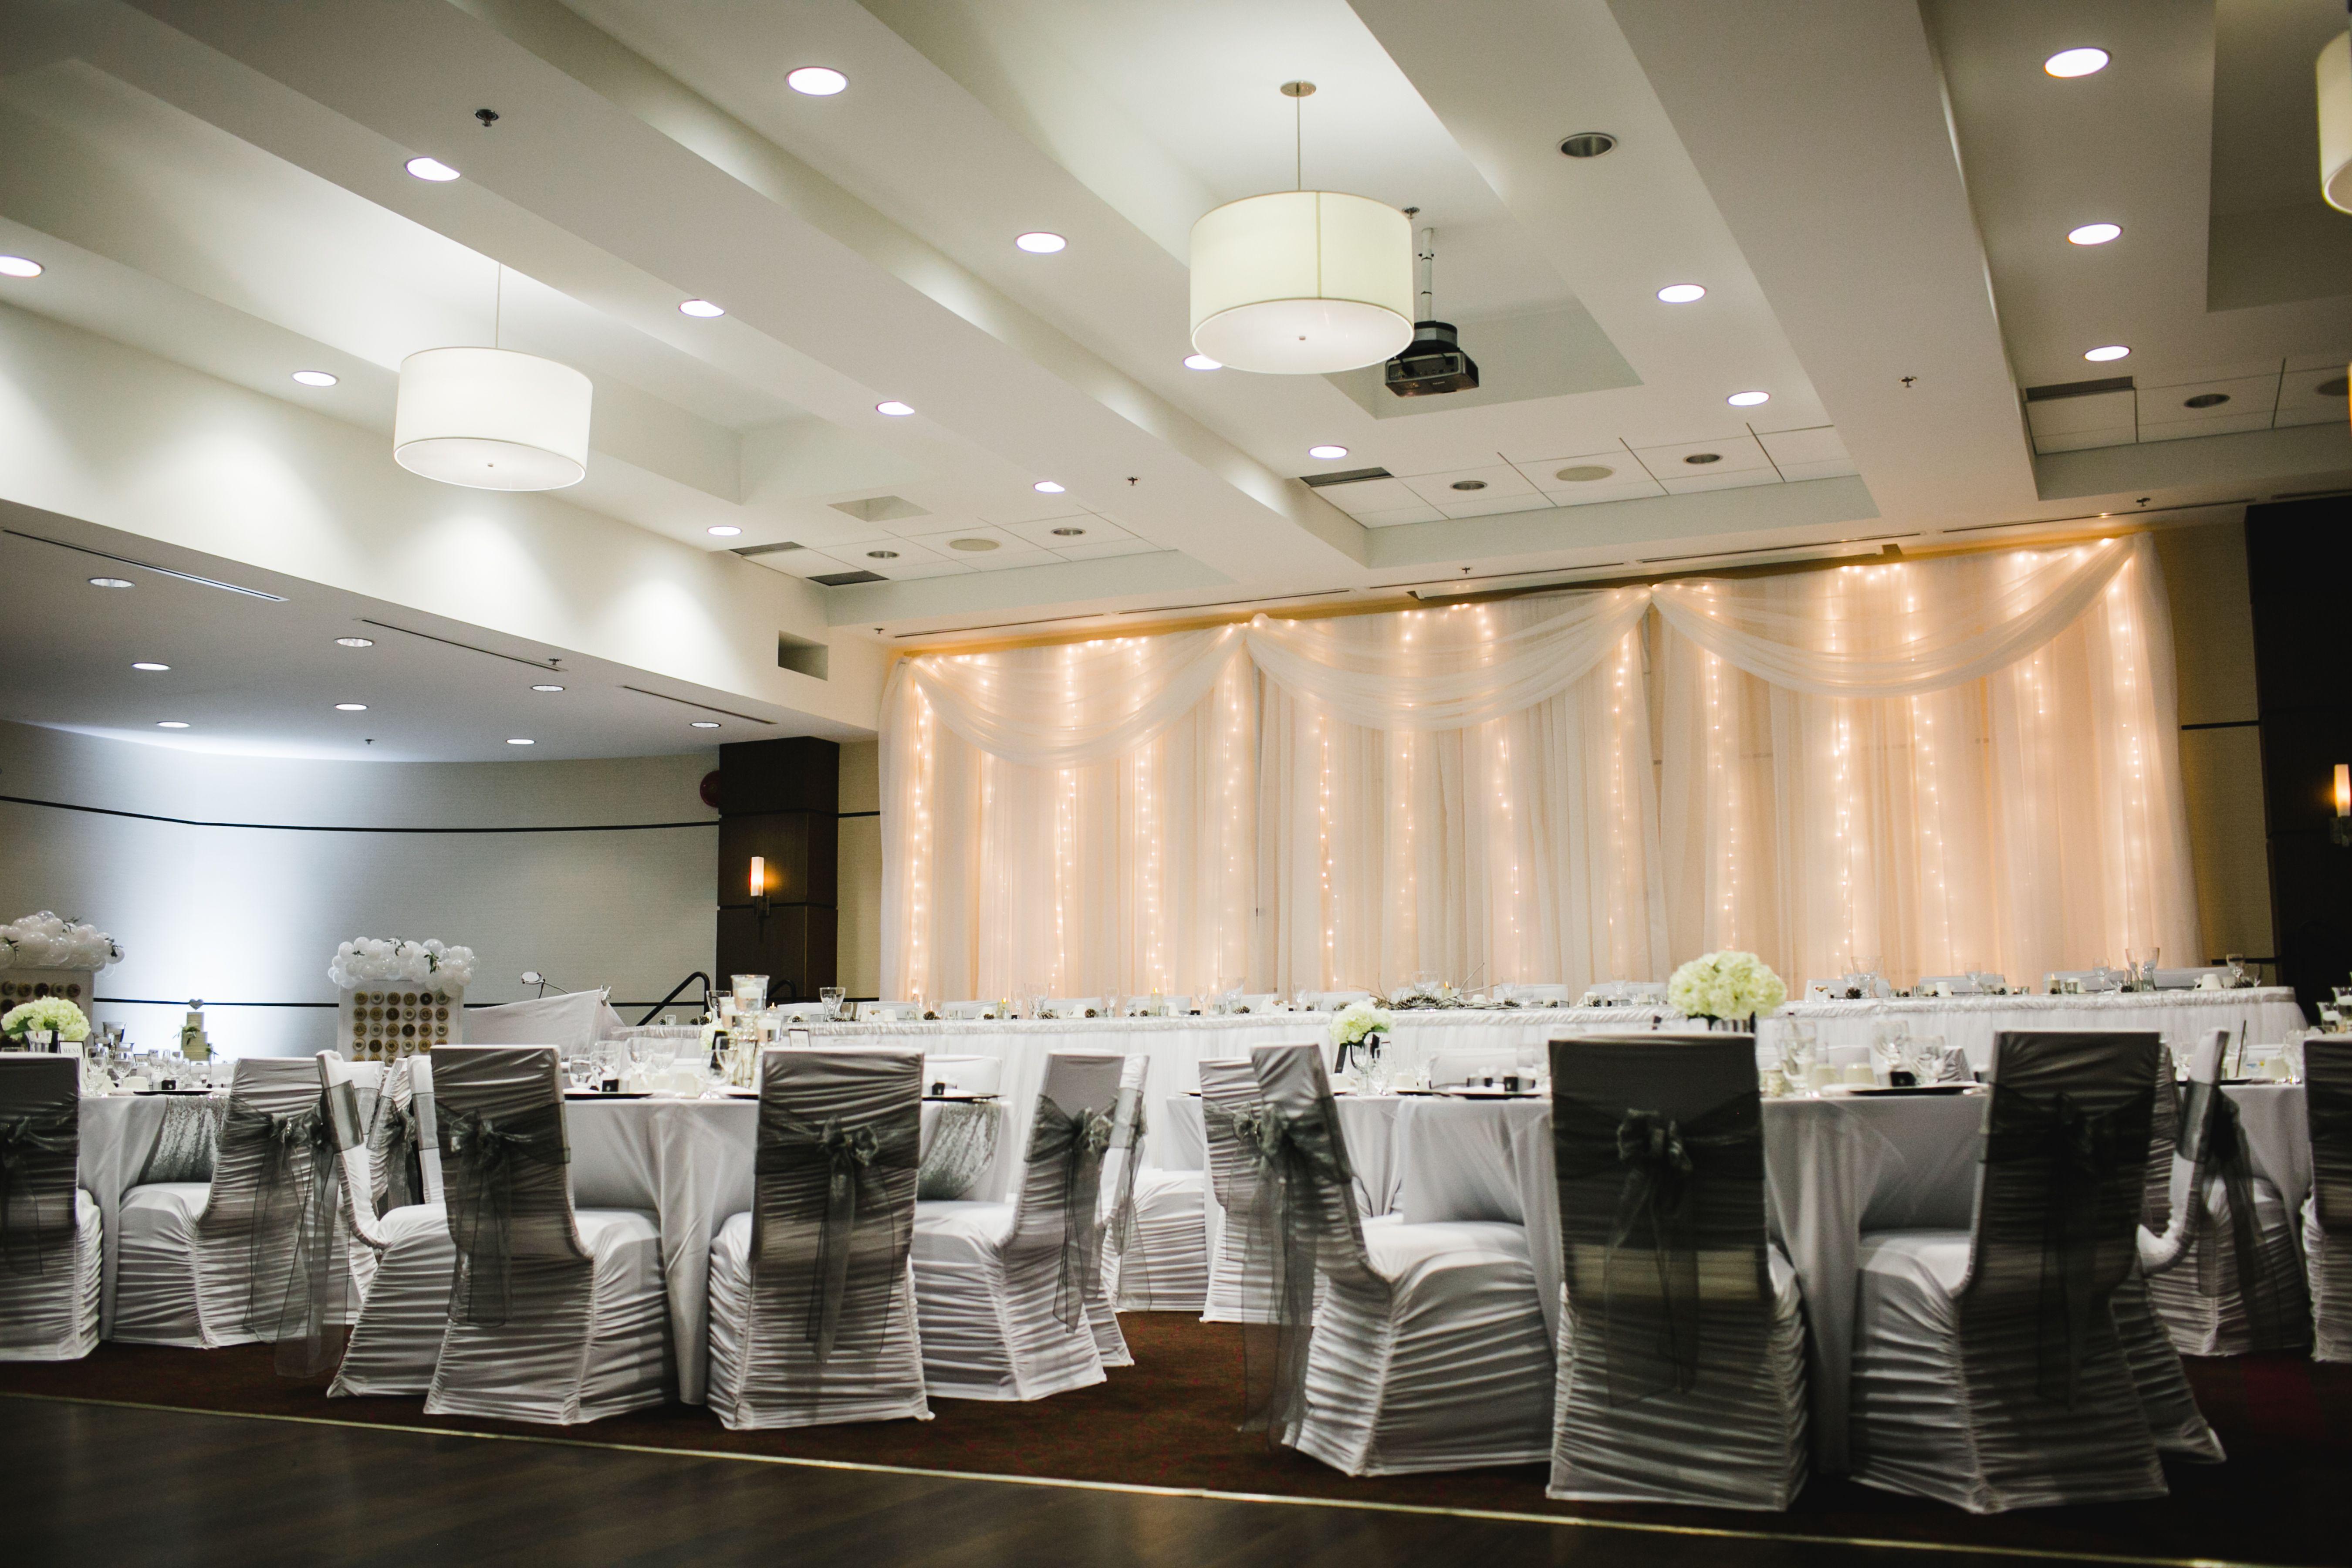 Wedding venue decoration ideas  Winnipeg Wedding Venue  Manhattan Grand Ballroom at the Four Points